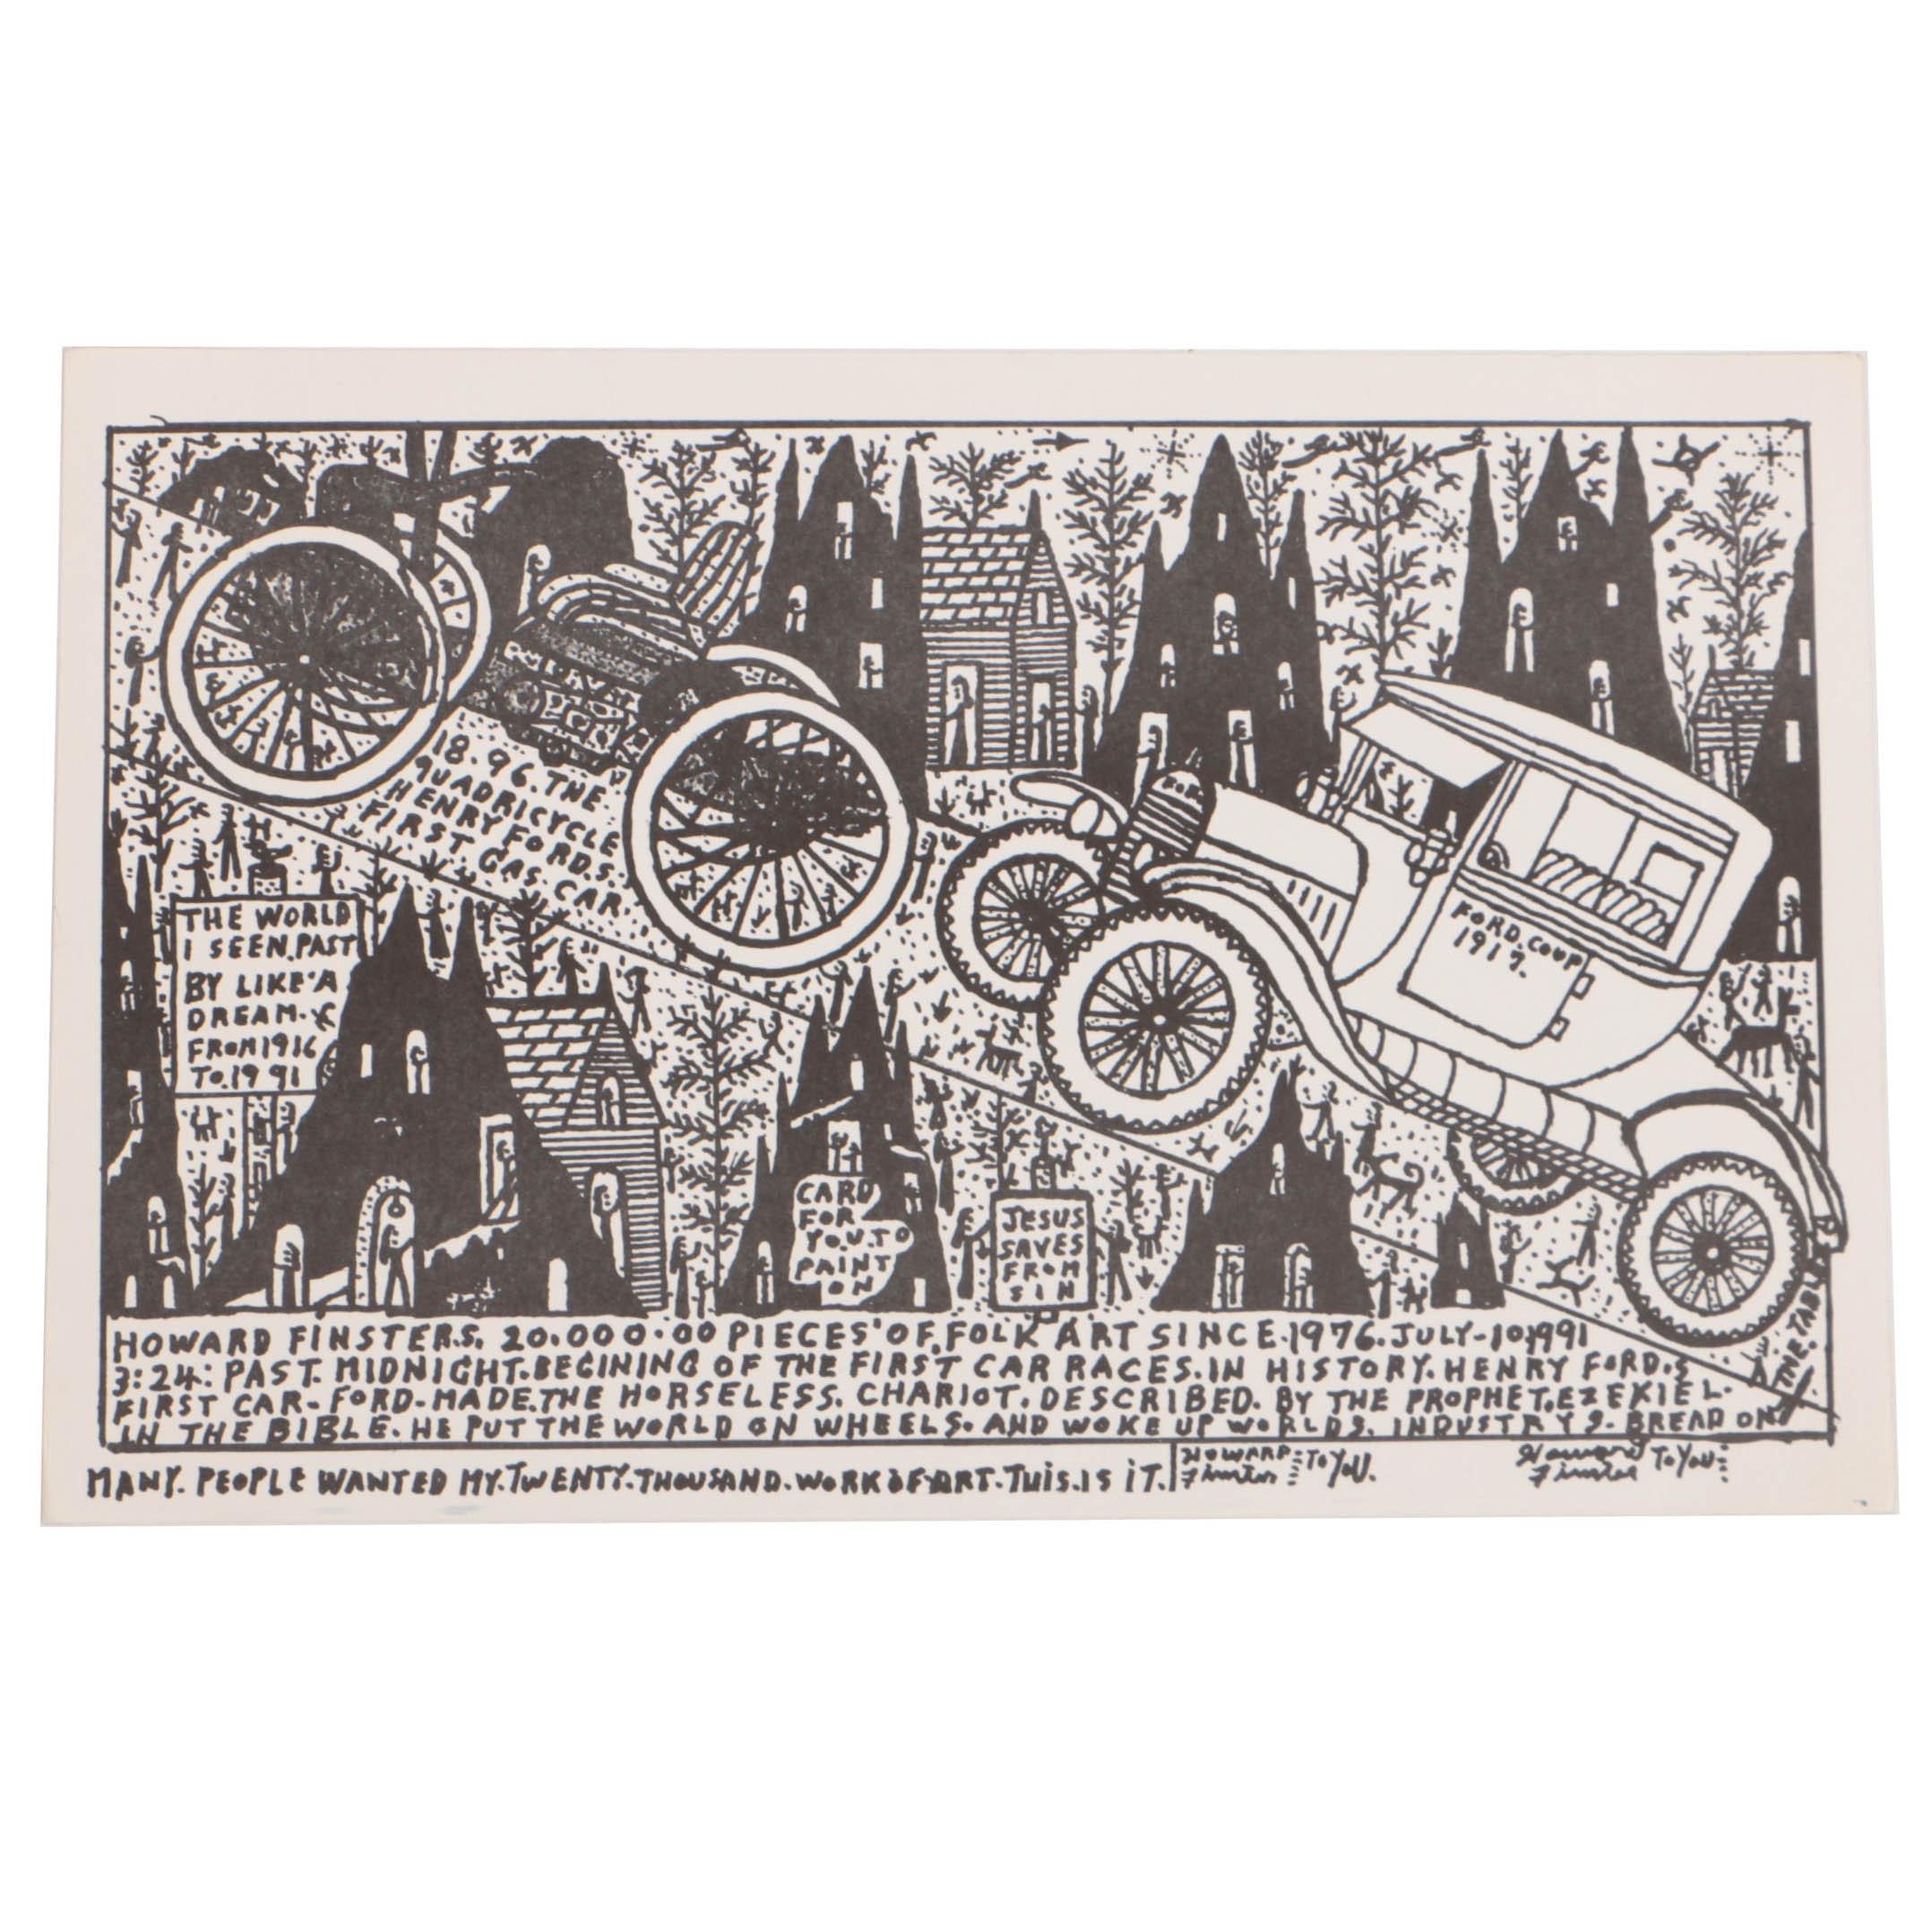 Howard Finster Poster Print of 20,000th Work of Art